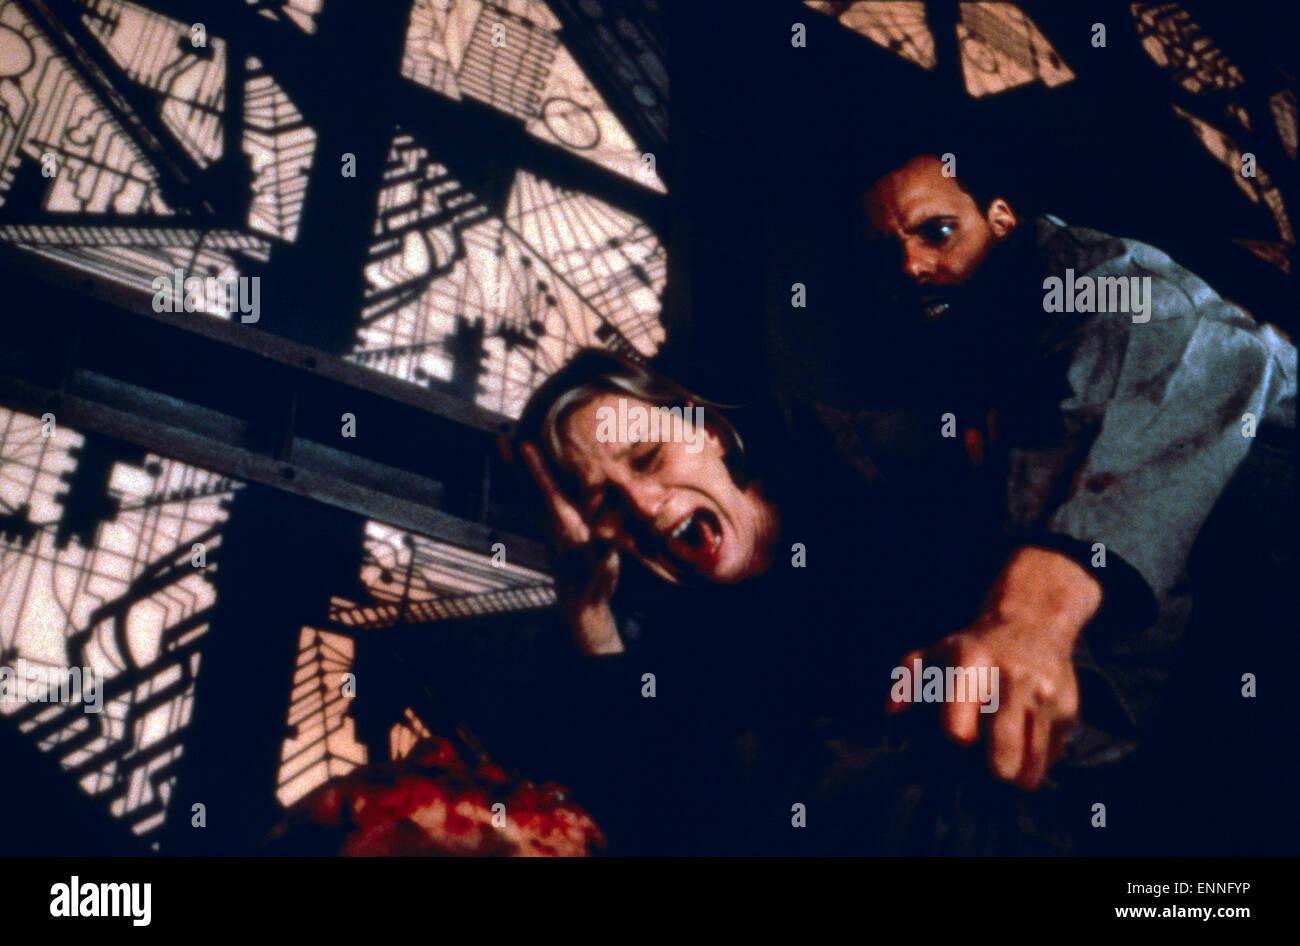 Watch James Redmond (born 1971) video